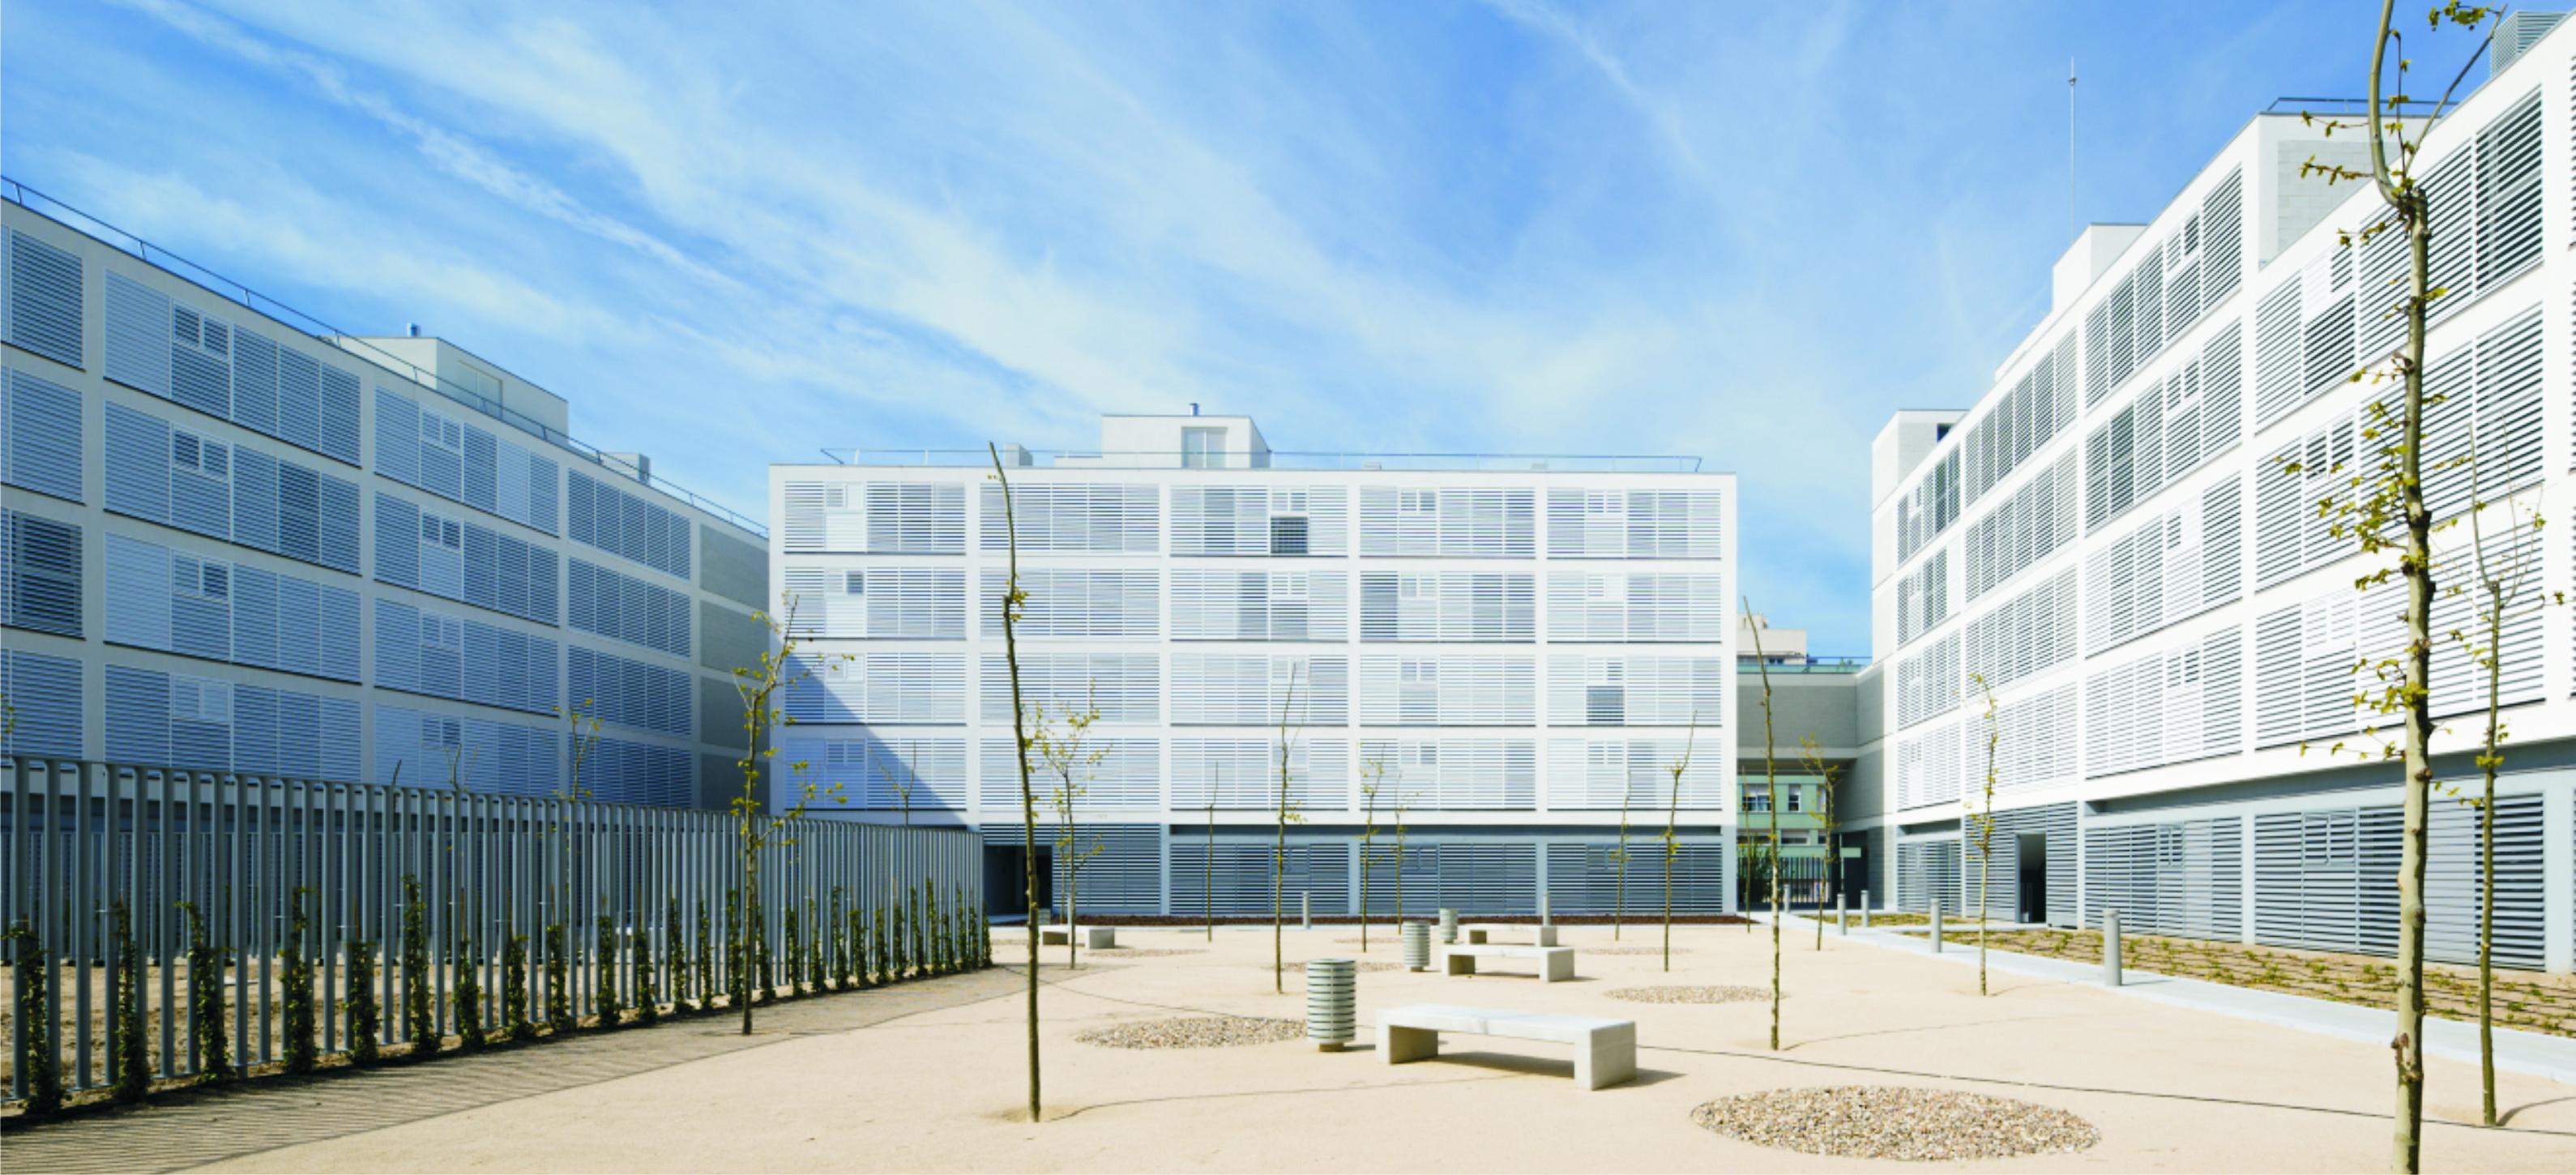 La promoci n vallecas 69 premio de la bienal espa ola de for Arquitectura 20 madrid